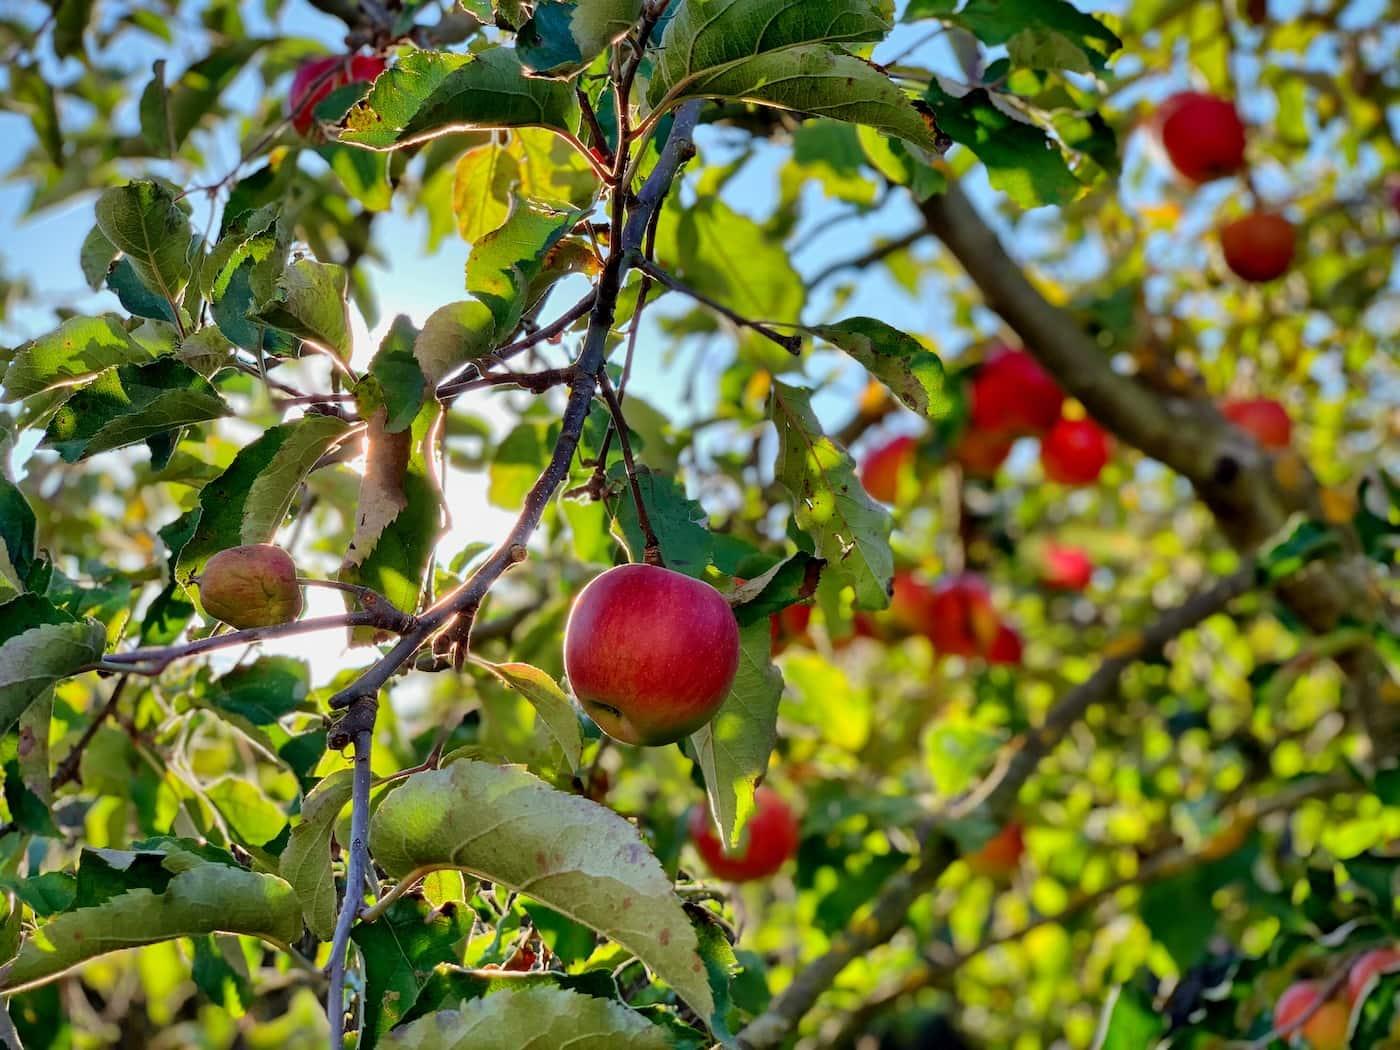 Apfelernte in der Herbstbauwoche für Kinder Ferienkurse in Berlin c Timotheus Fröbel //HIMBEER